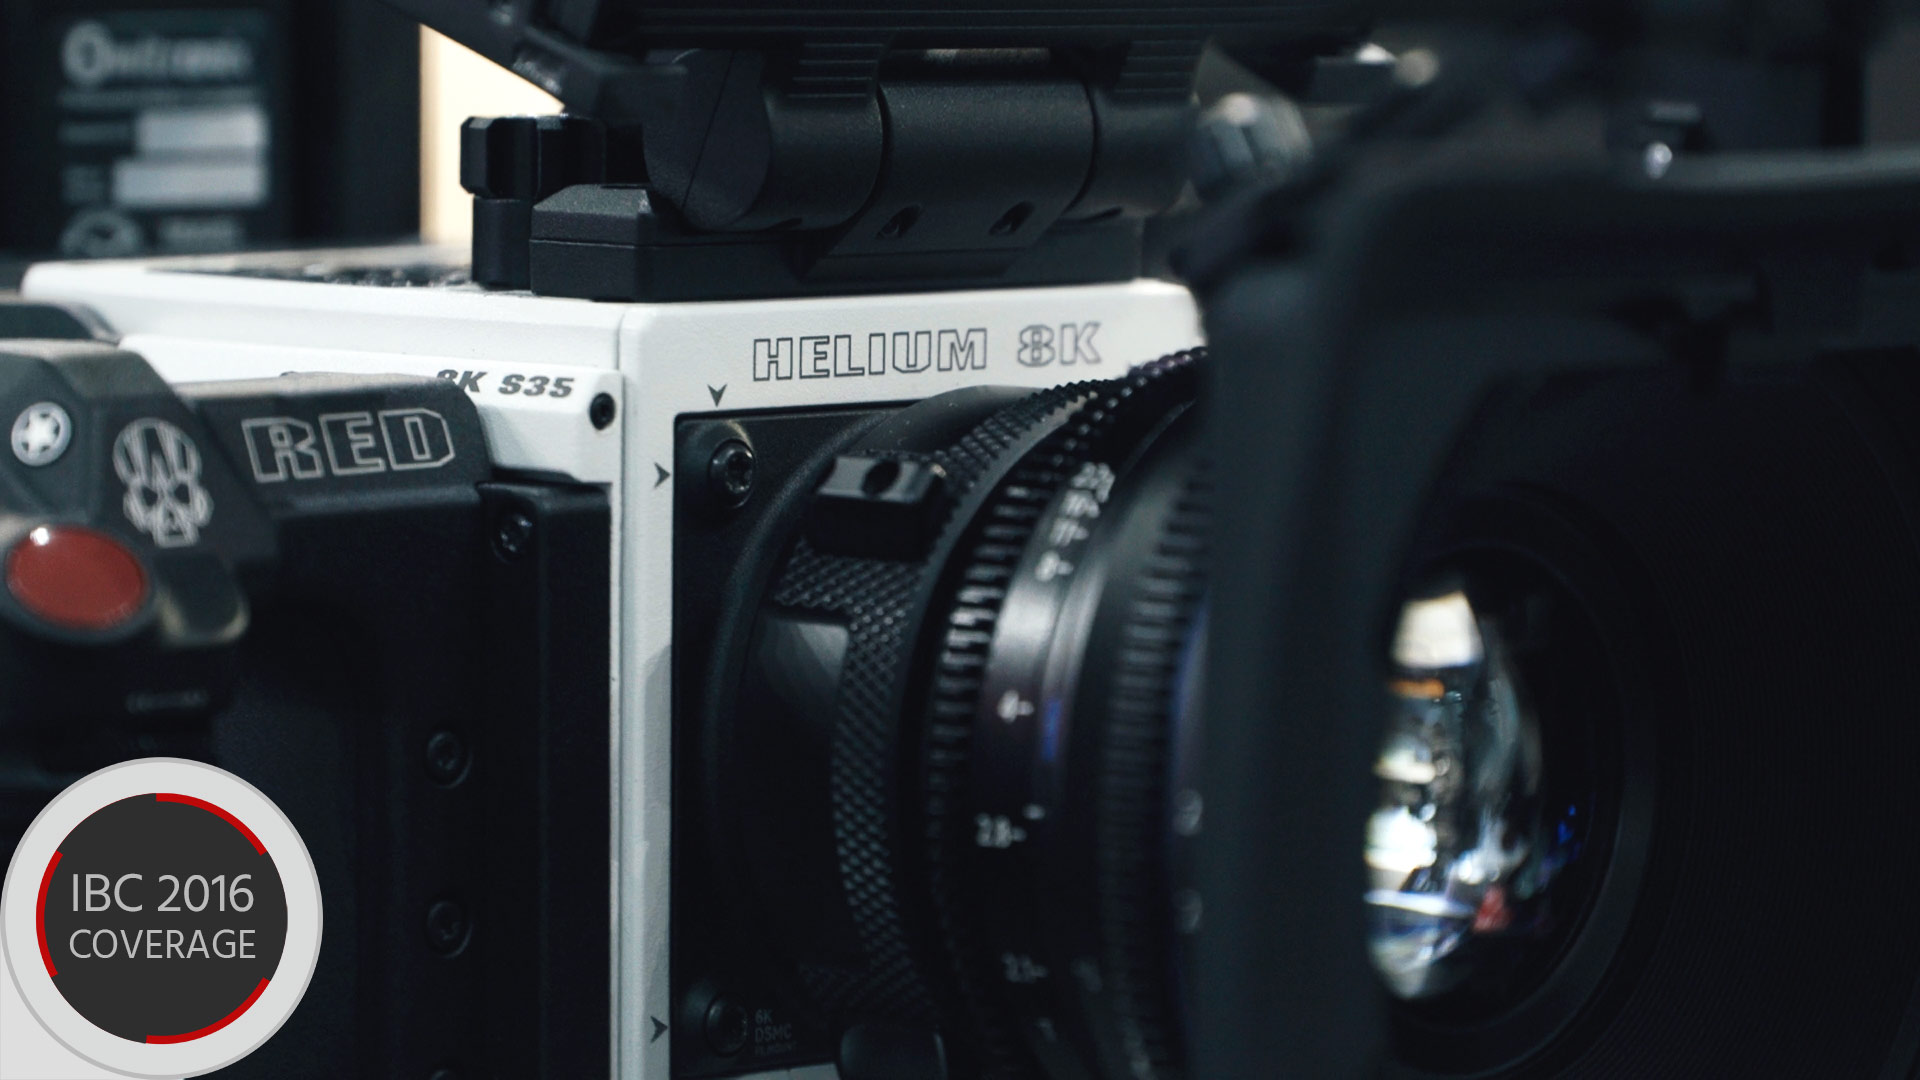 RED Weapon Helium 8Kカメラ — 白い筐体をIBCで初展示